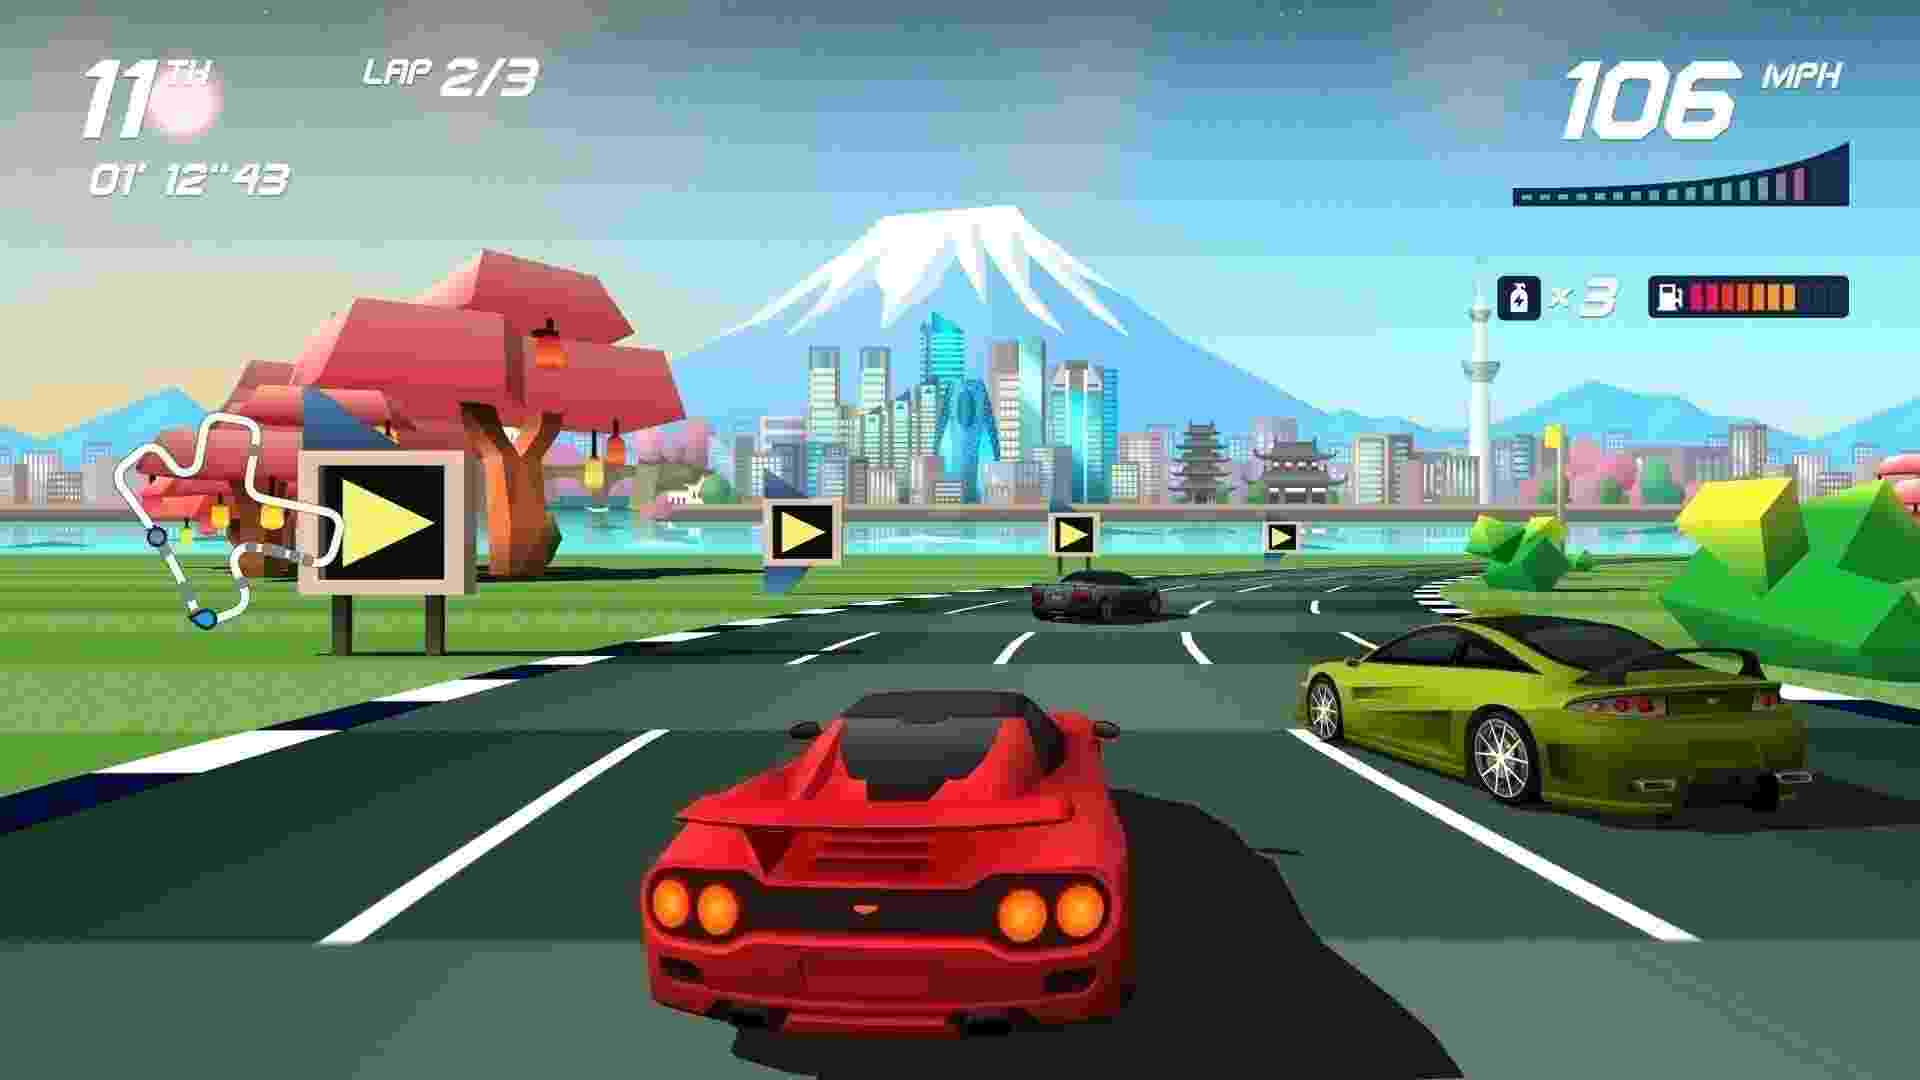 Horizon Chase Turbo - Reprodução